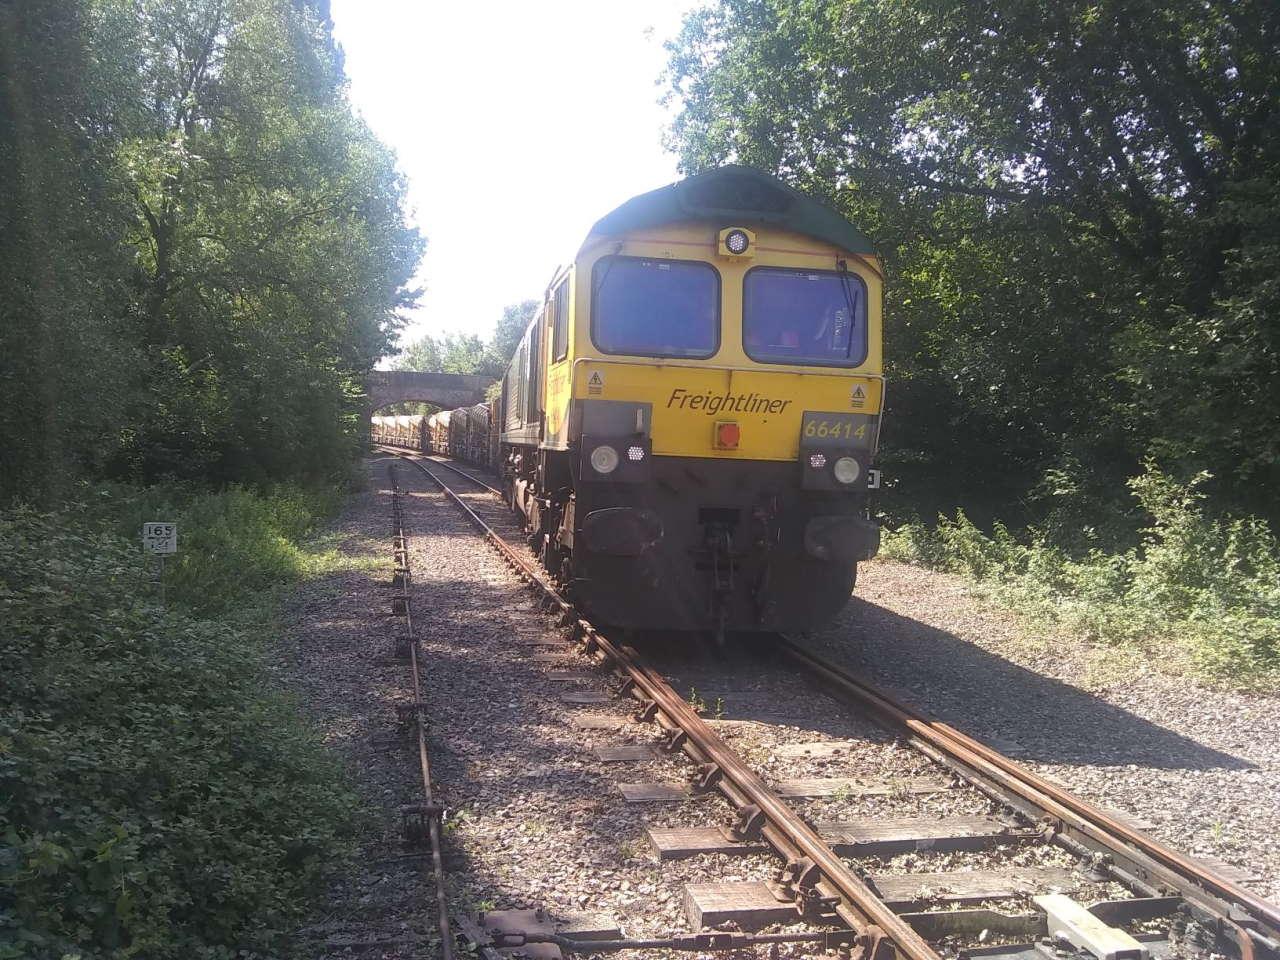 66414 setting back at Allerford